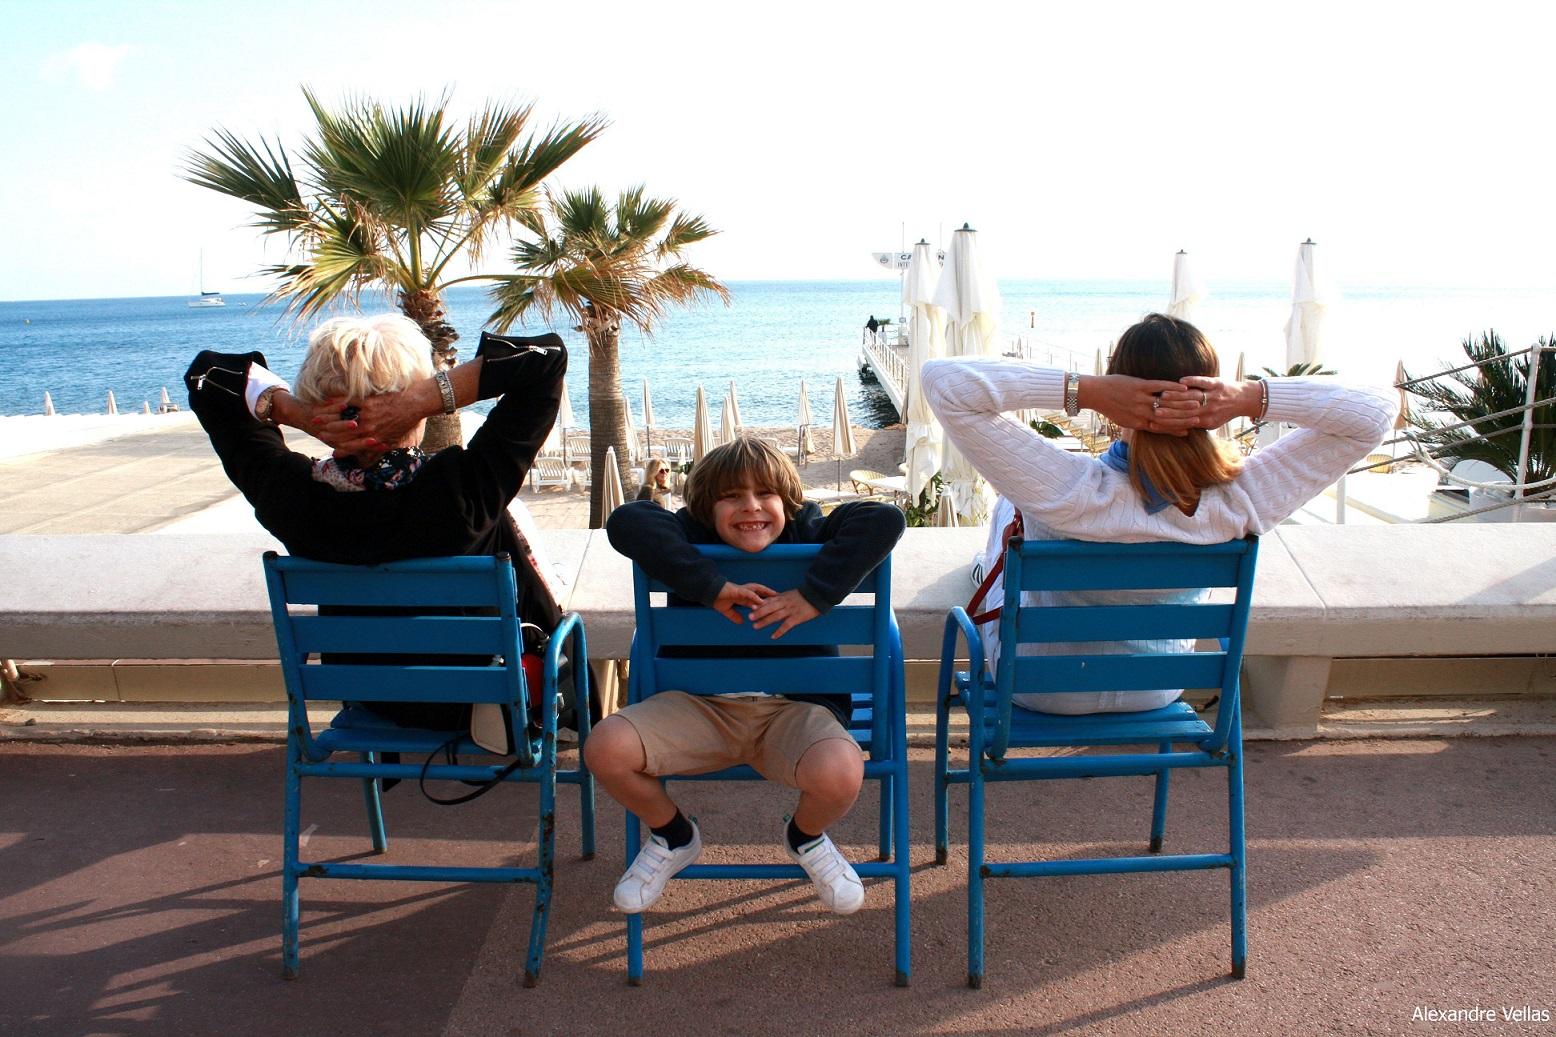 Stile e Moda a Cannes, sedie blu